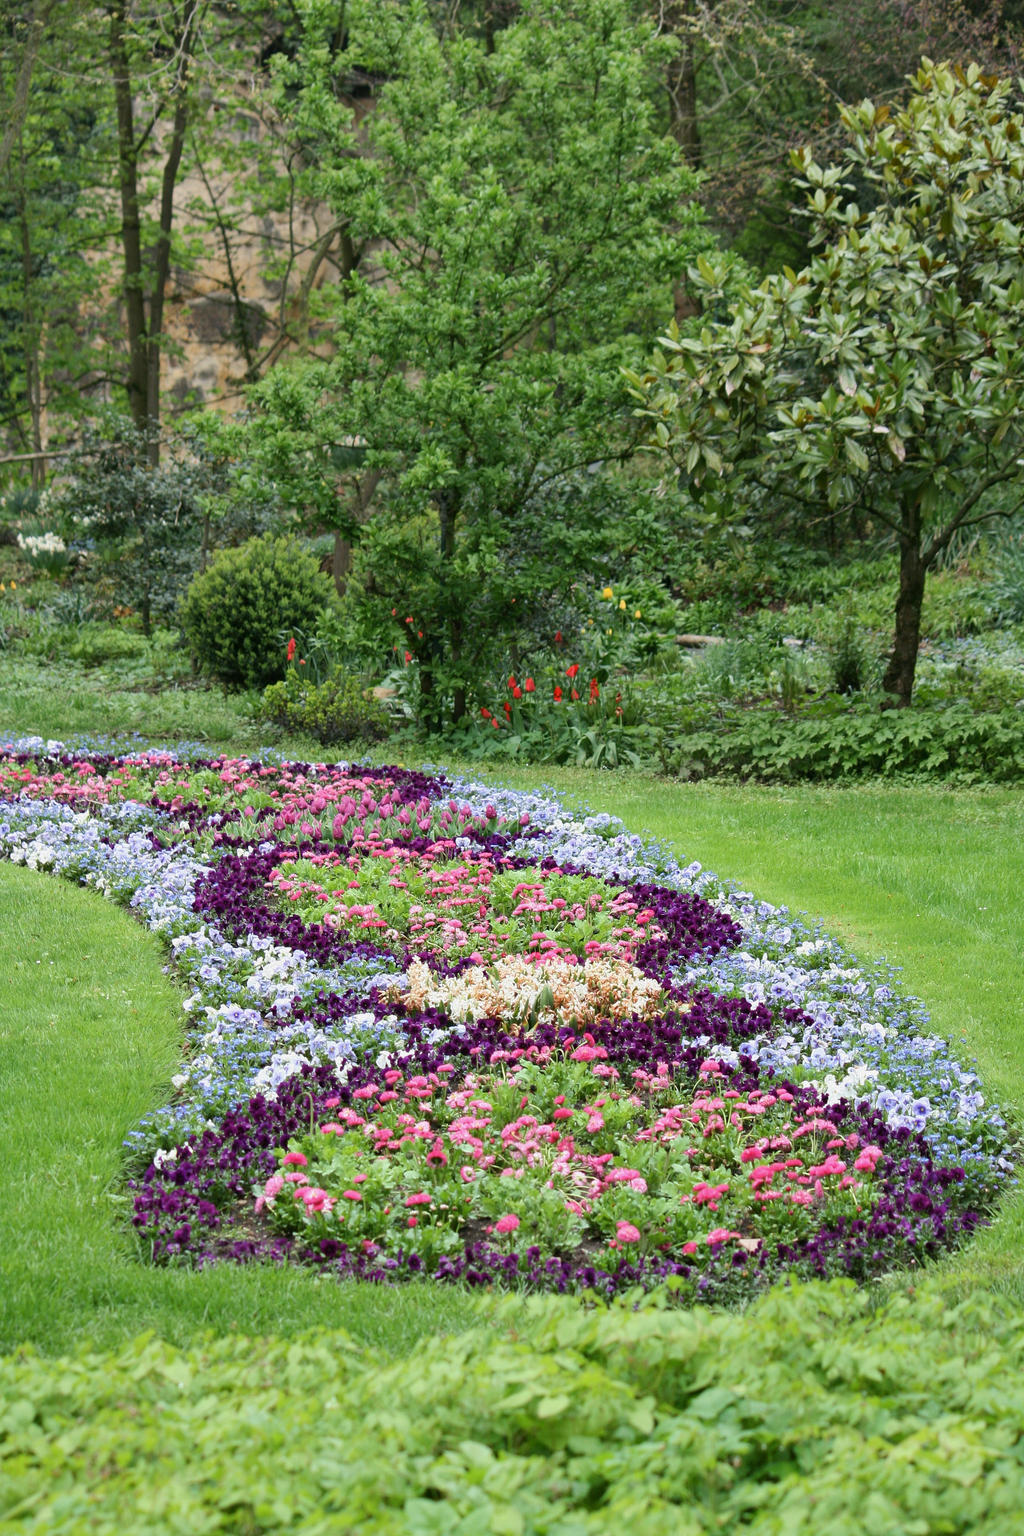 Bloomin In Baroque Garden Ludwigsburg 2 By Ingeline Art On